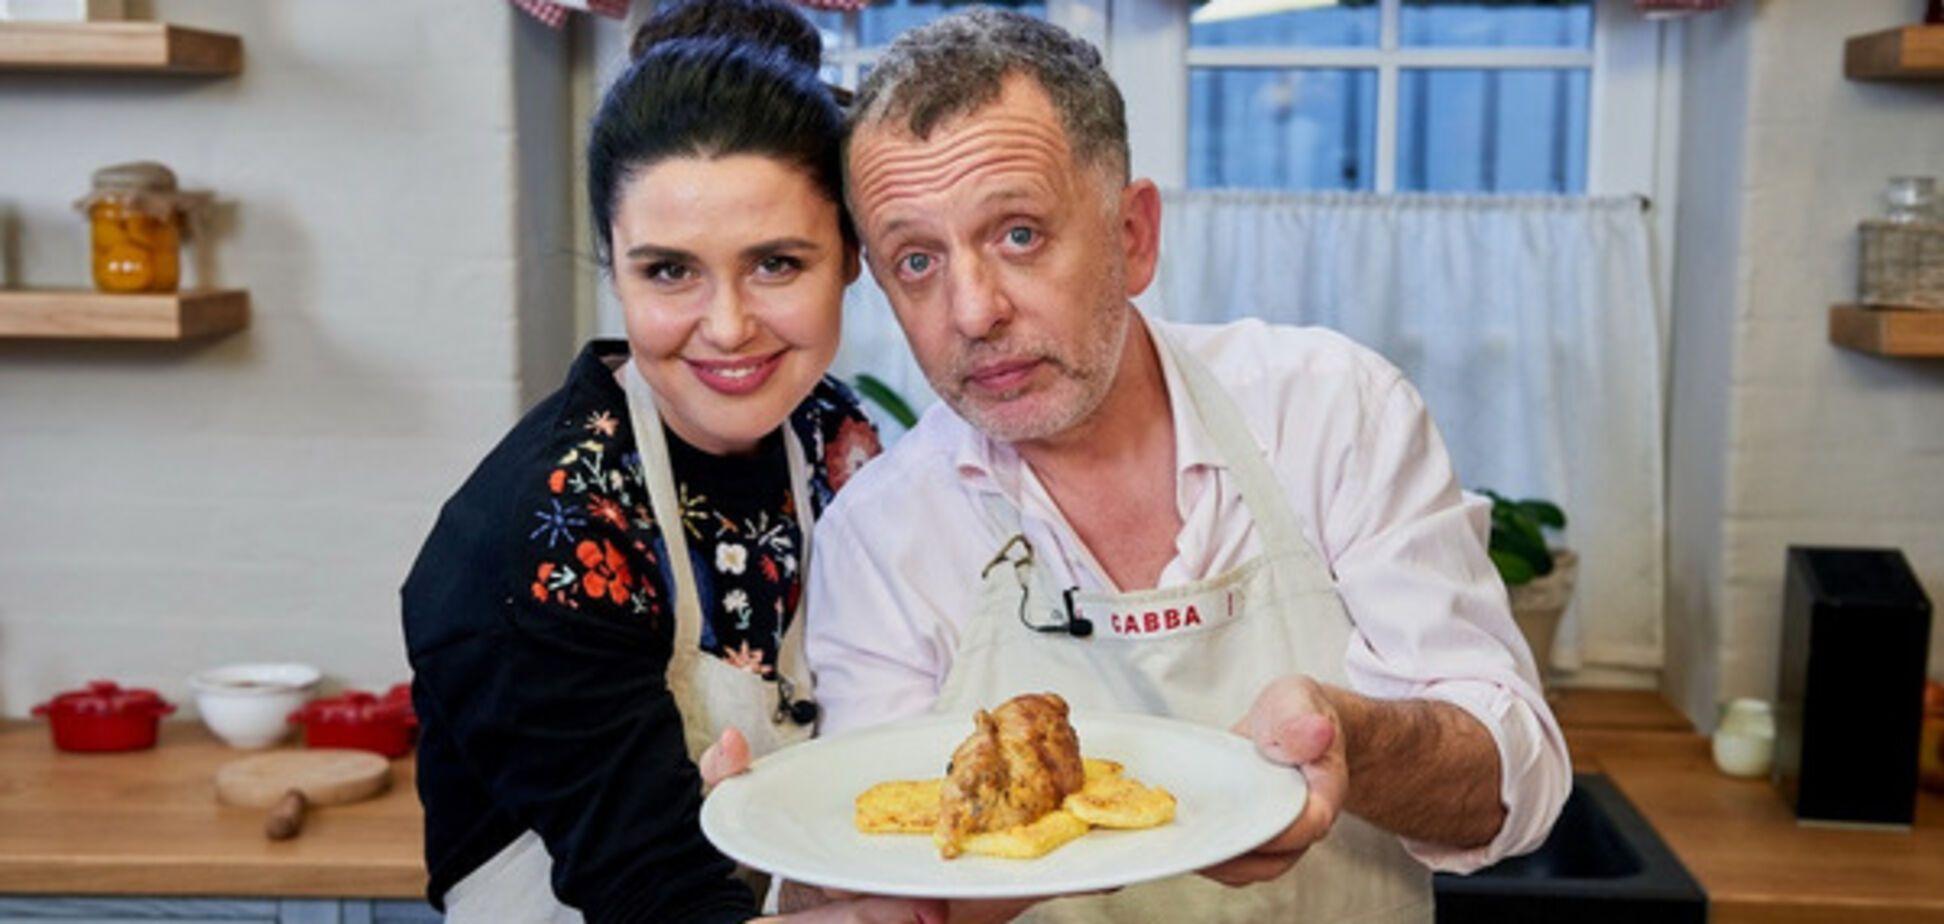 Людмила Барбир и Савва Либкин